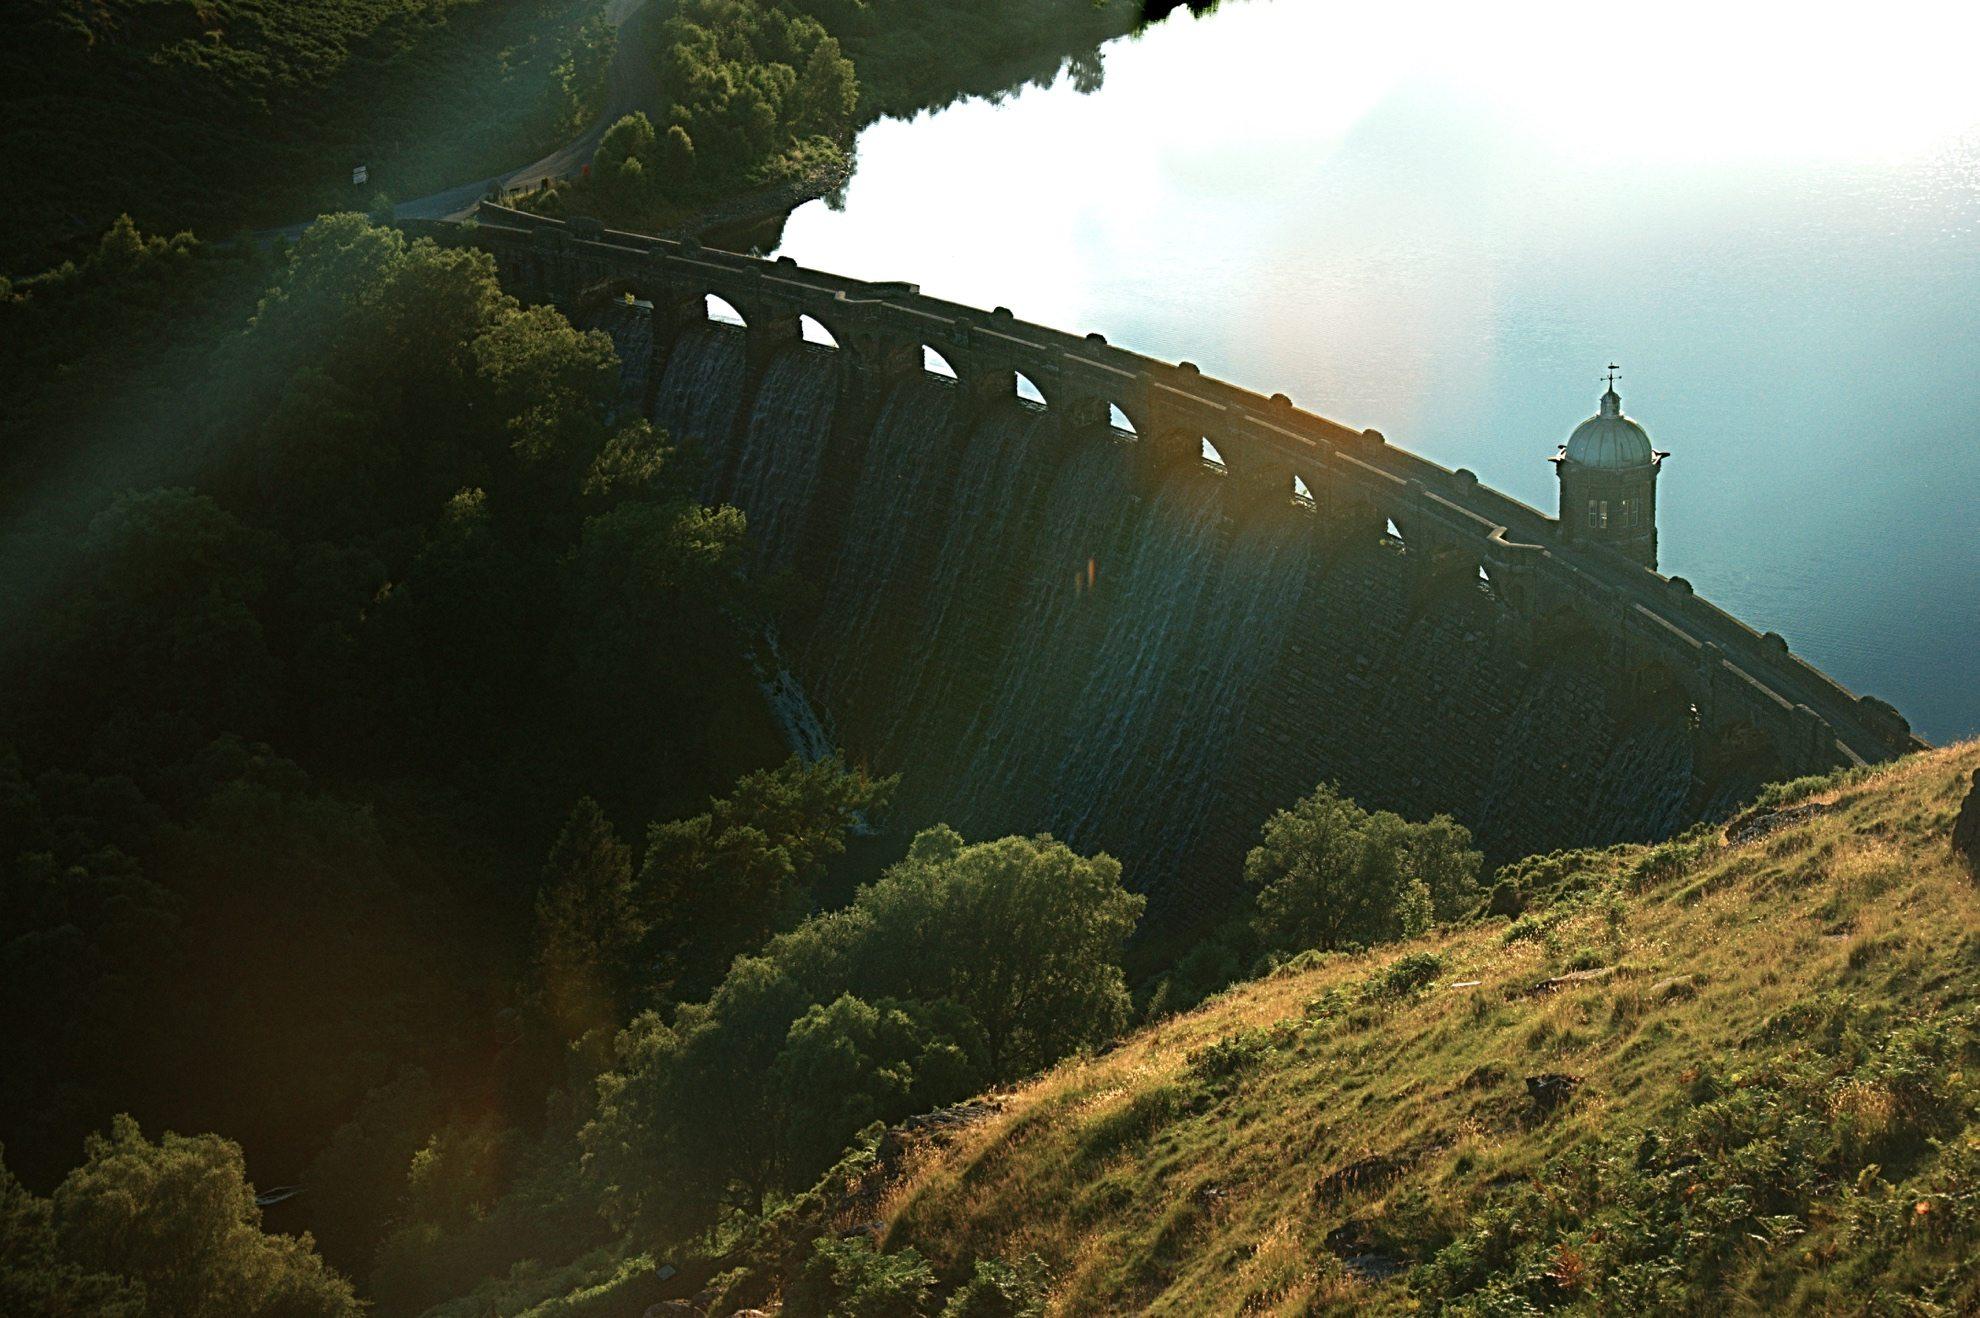 Sunset Elan Valley – adamhaworth.com